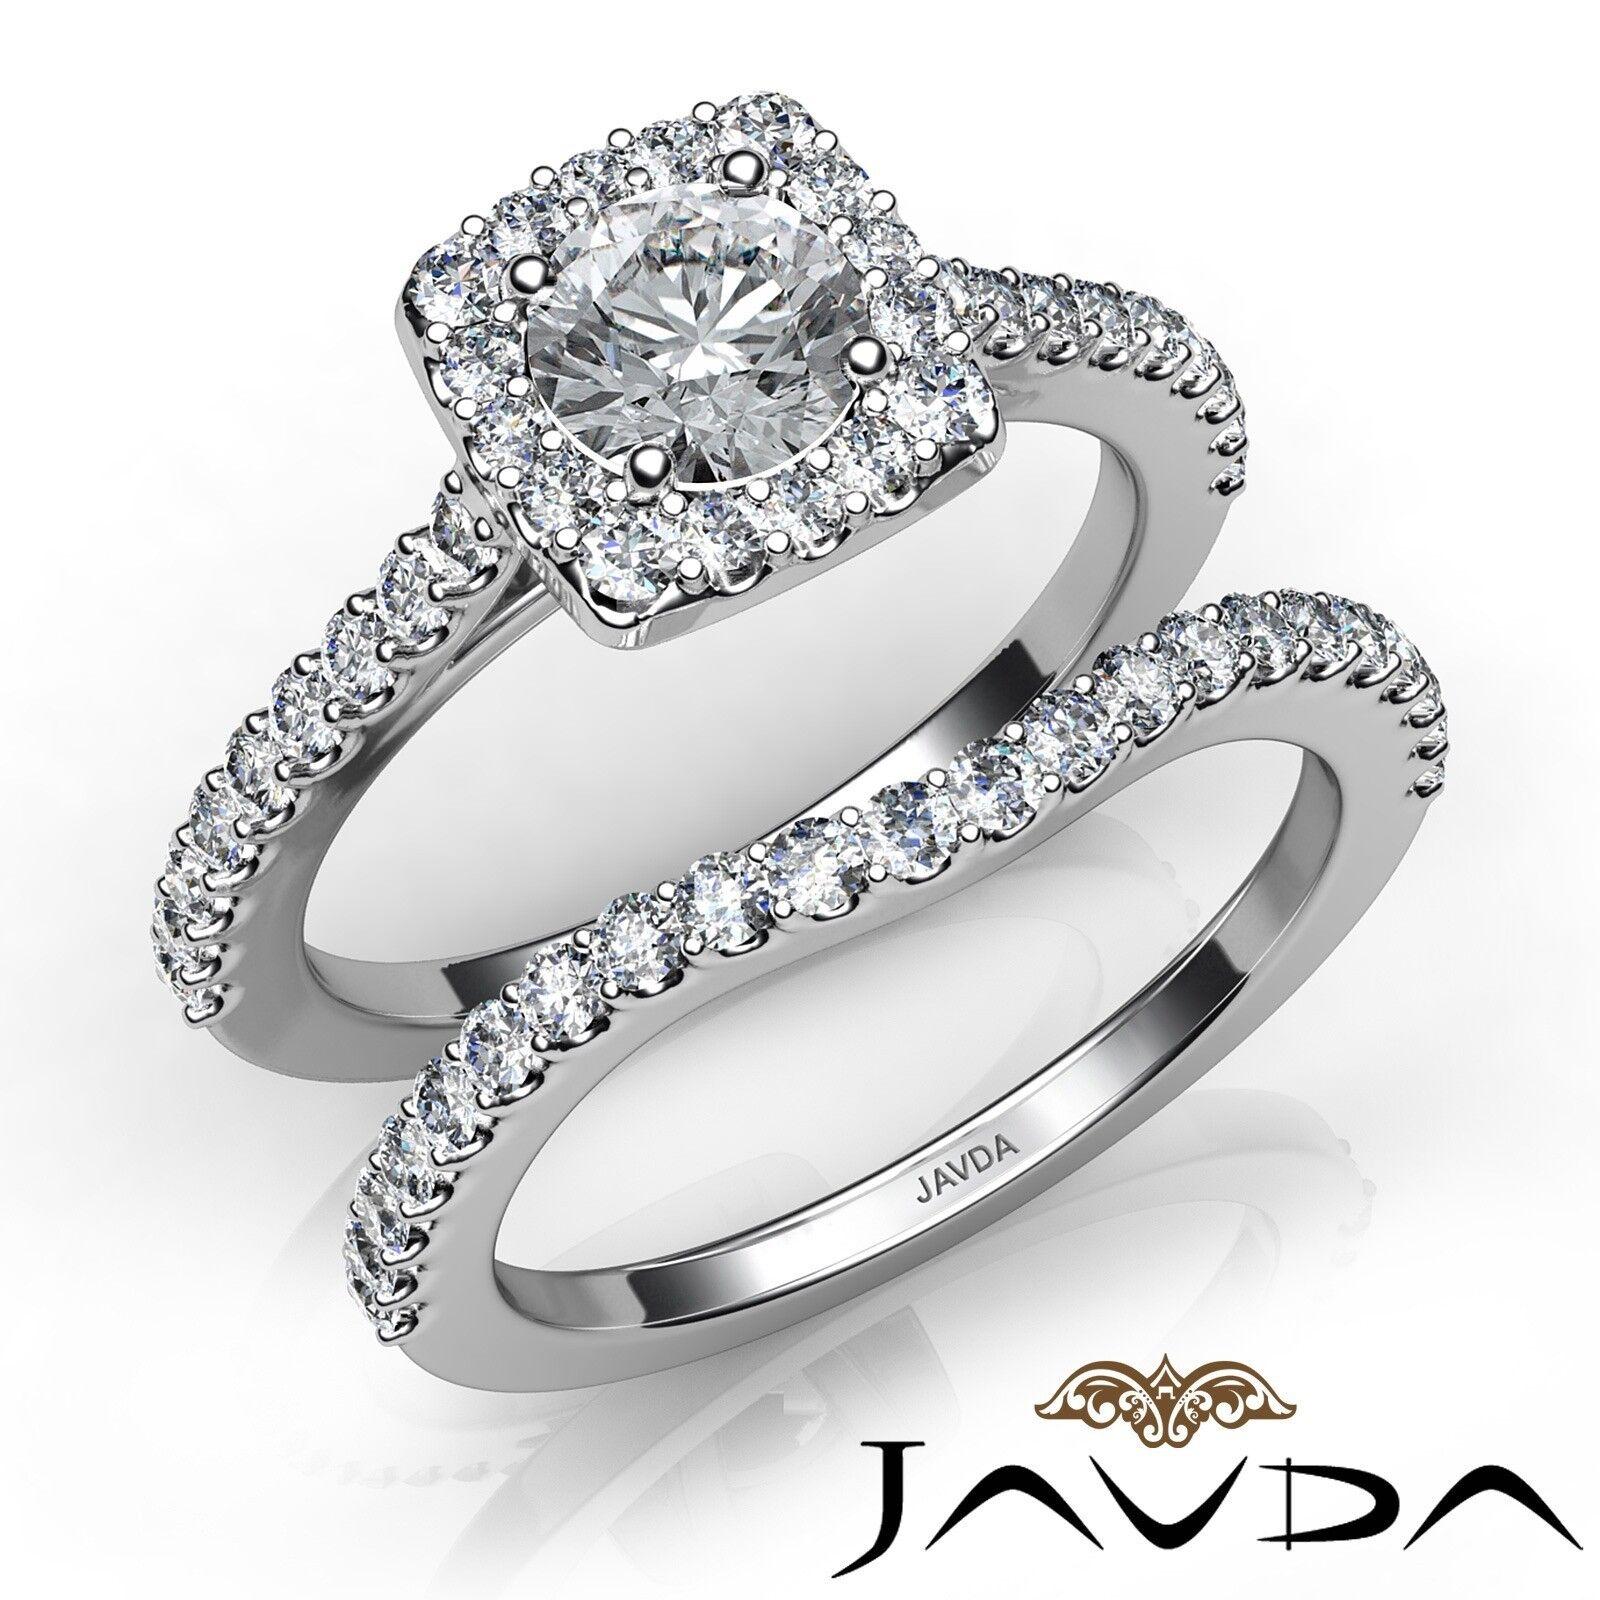 1.67ctw Halo U Prong Bridal Set Round Diamond Engagement Ring GIA F-SI1 W Gold